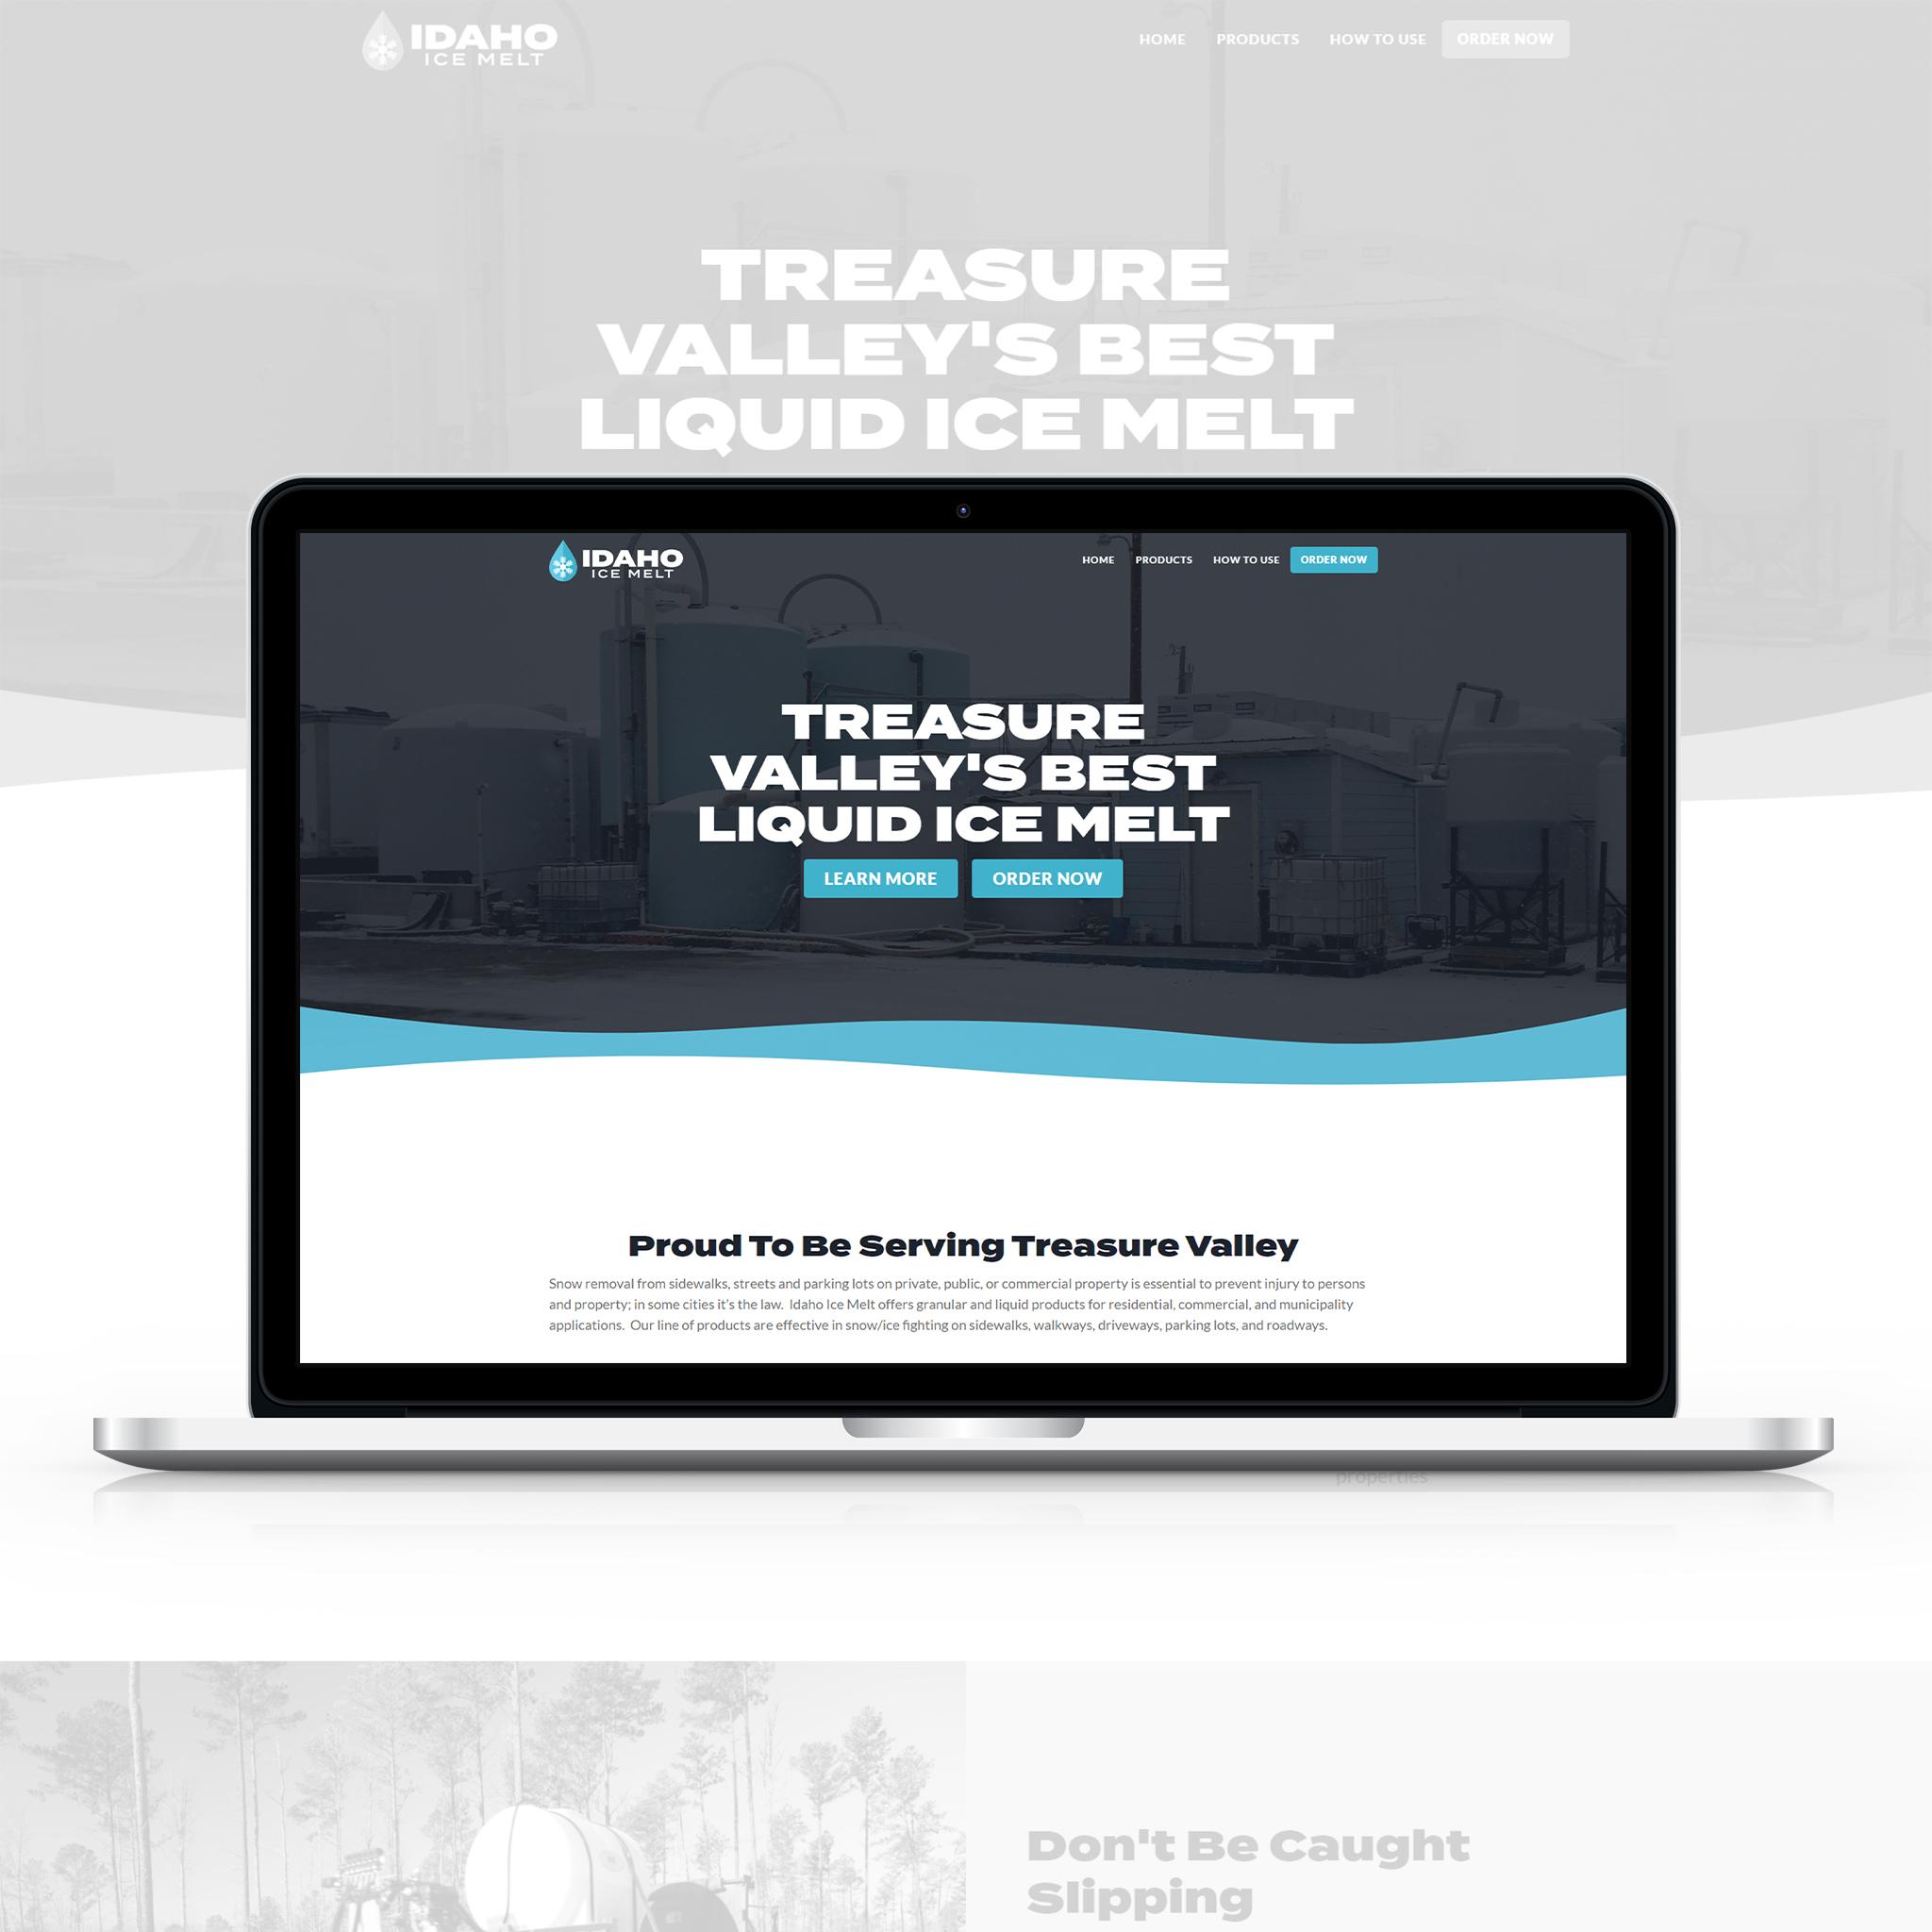 Idaho Ice Melt Website